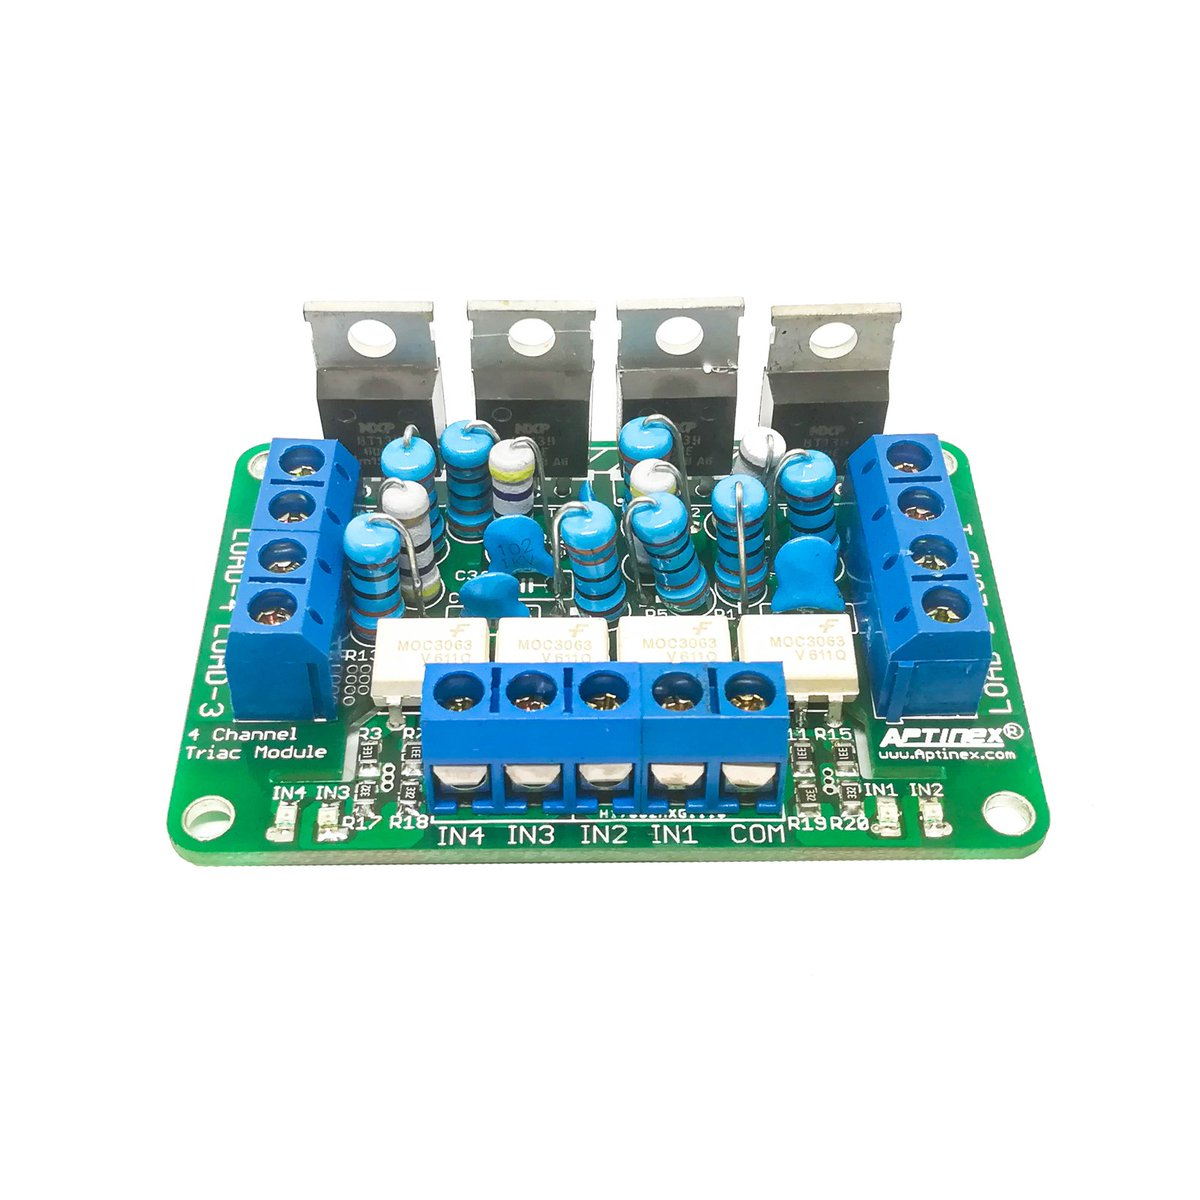 Aptinex Pvt Ltd On Twitter Four Channel Opto Isolated Triac Circuit Module Based Moc3061 Bt139 Max Ratings Per 600v 16a Phototriac Driver Moc3063 Https Googl Kaspdz